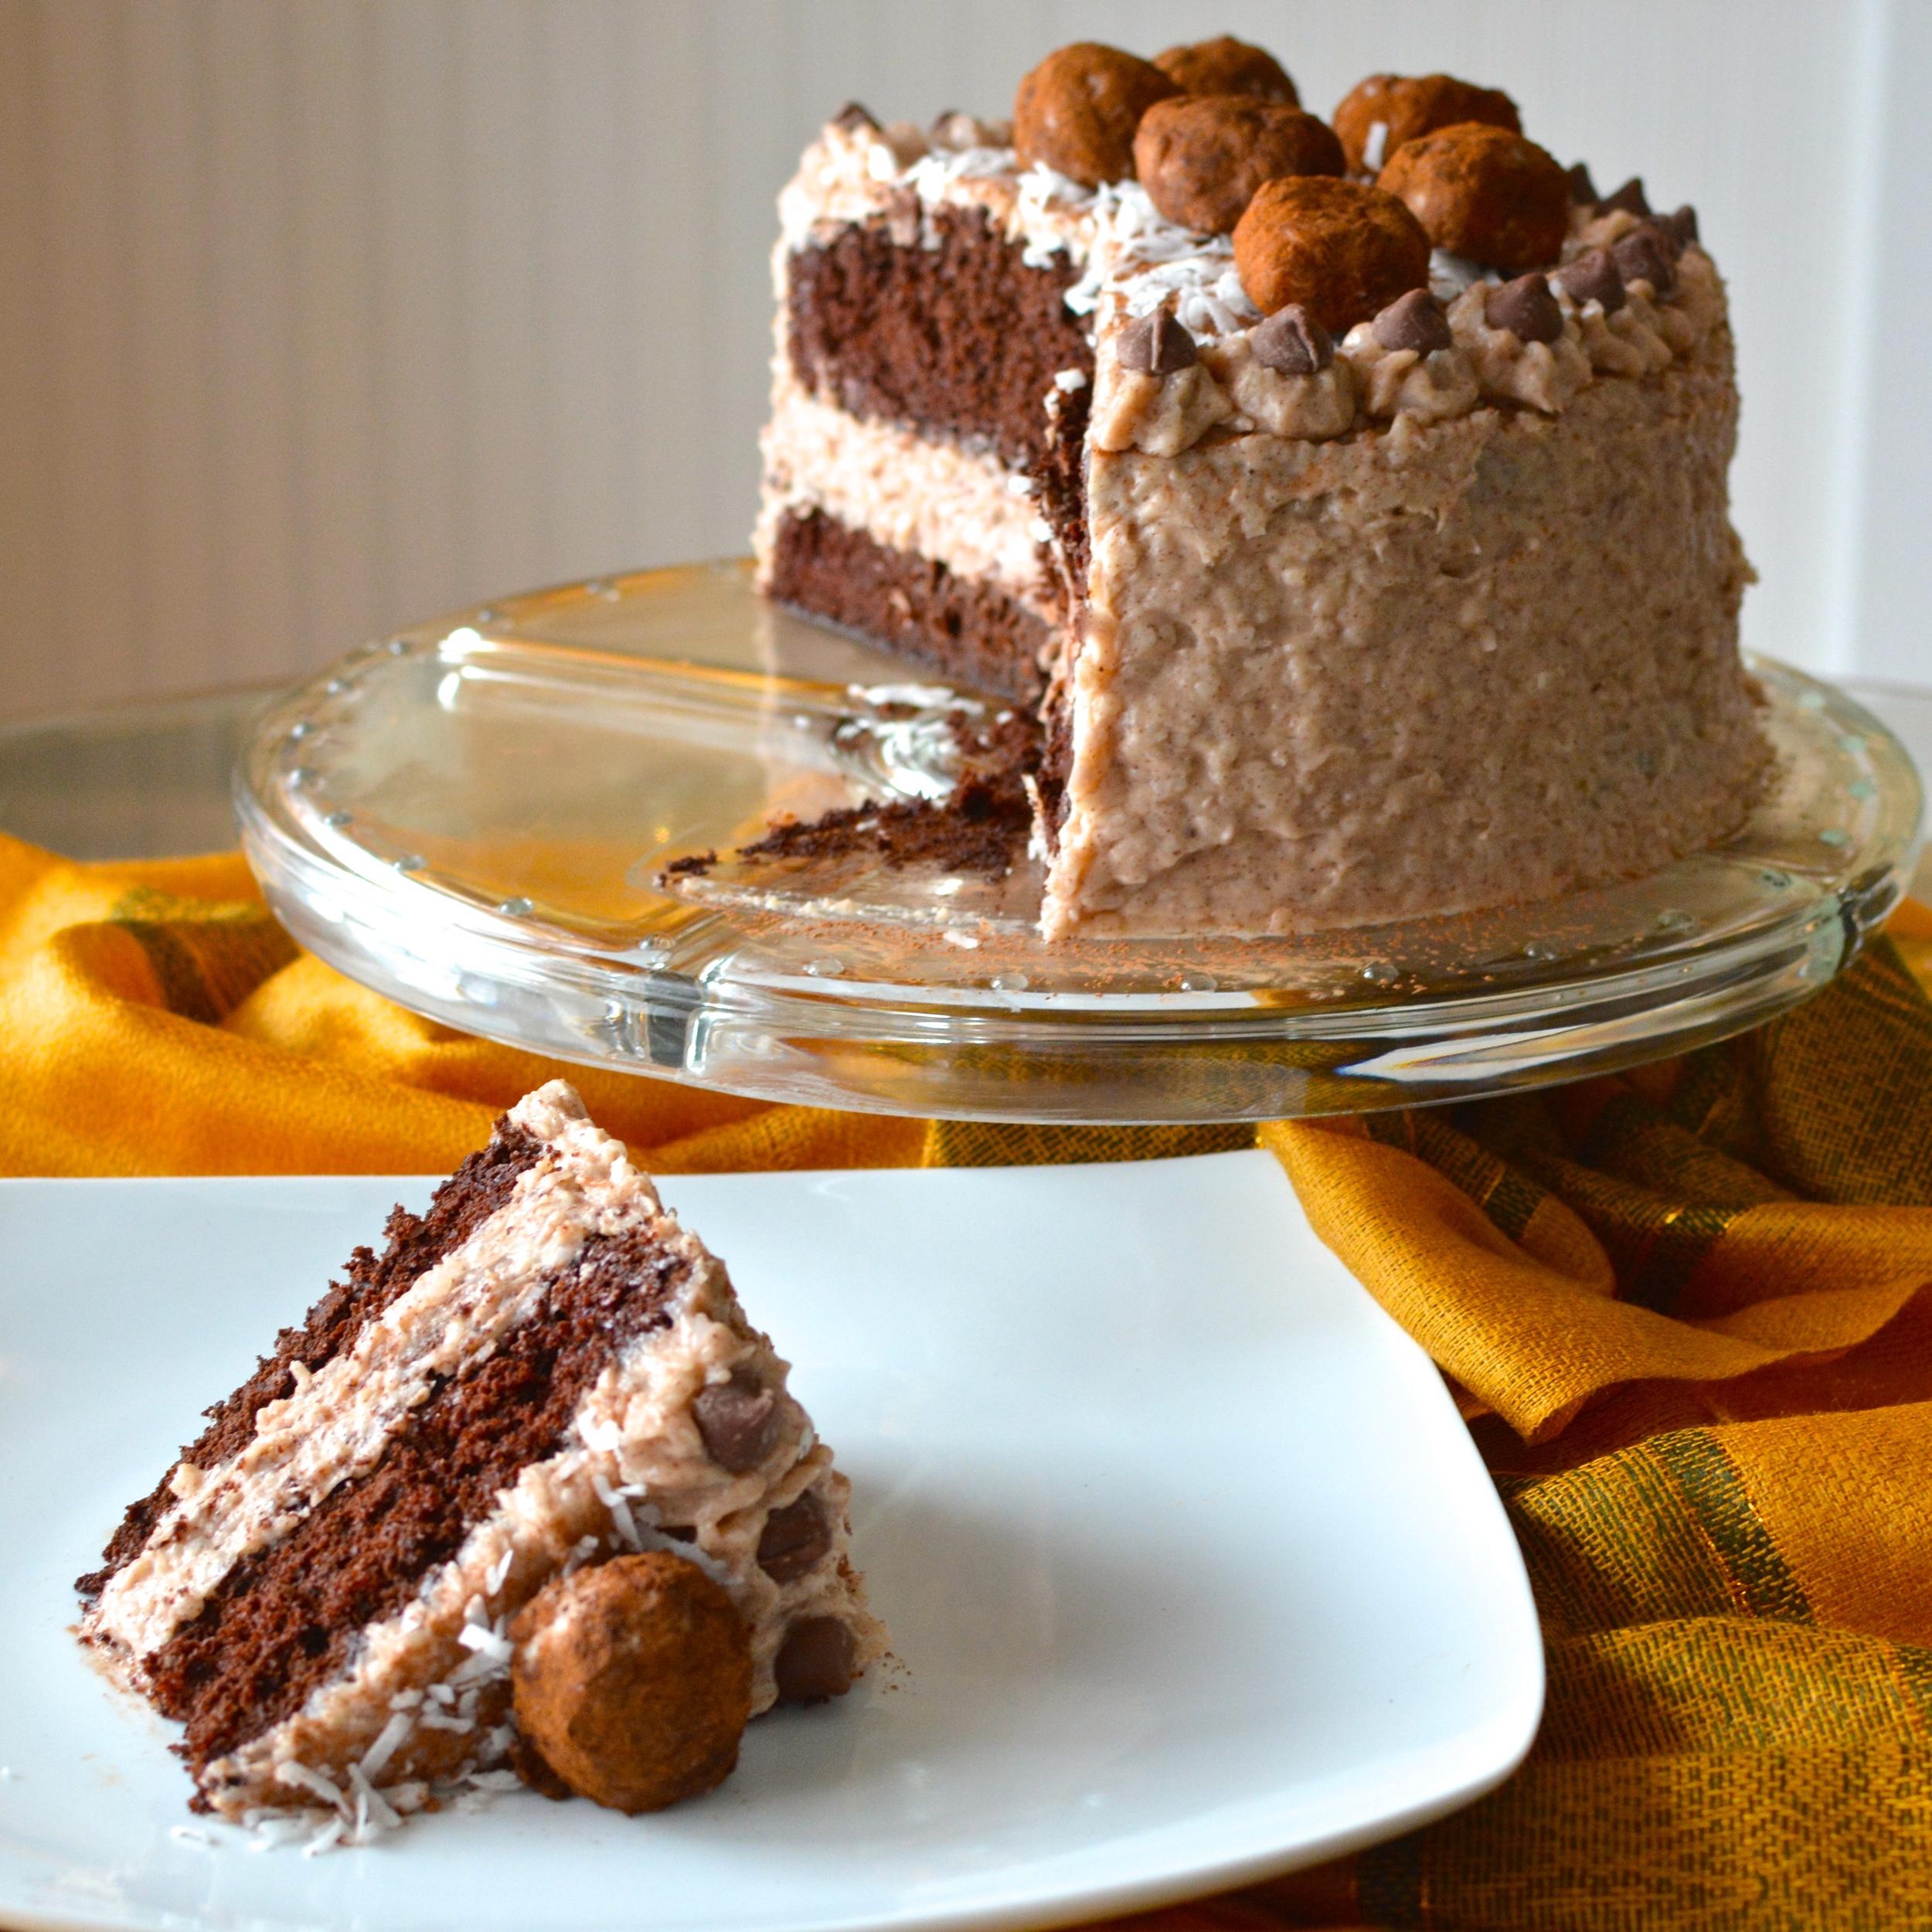 Irish Potato Cake - Rich Chocolate Cake with Cinnamon Coconut Cream Cheese Frosting